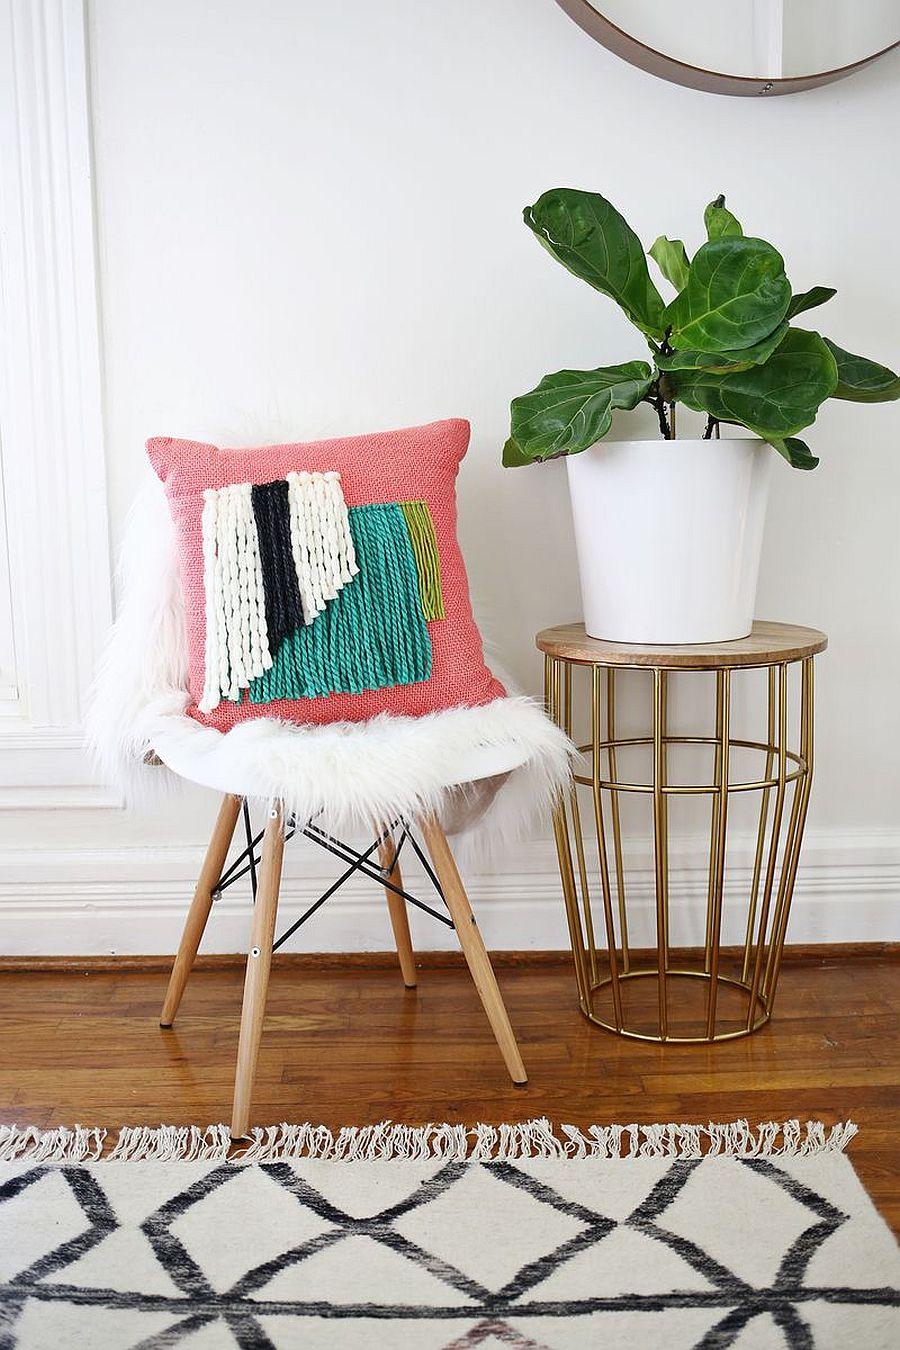 Yarn Fringe Pillow DIY is super chic and stylish